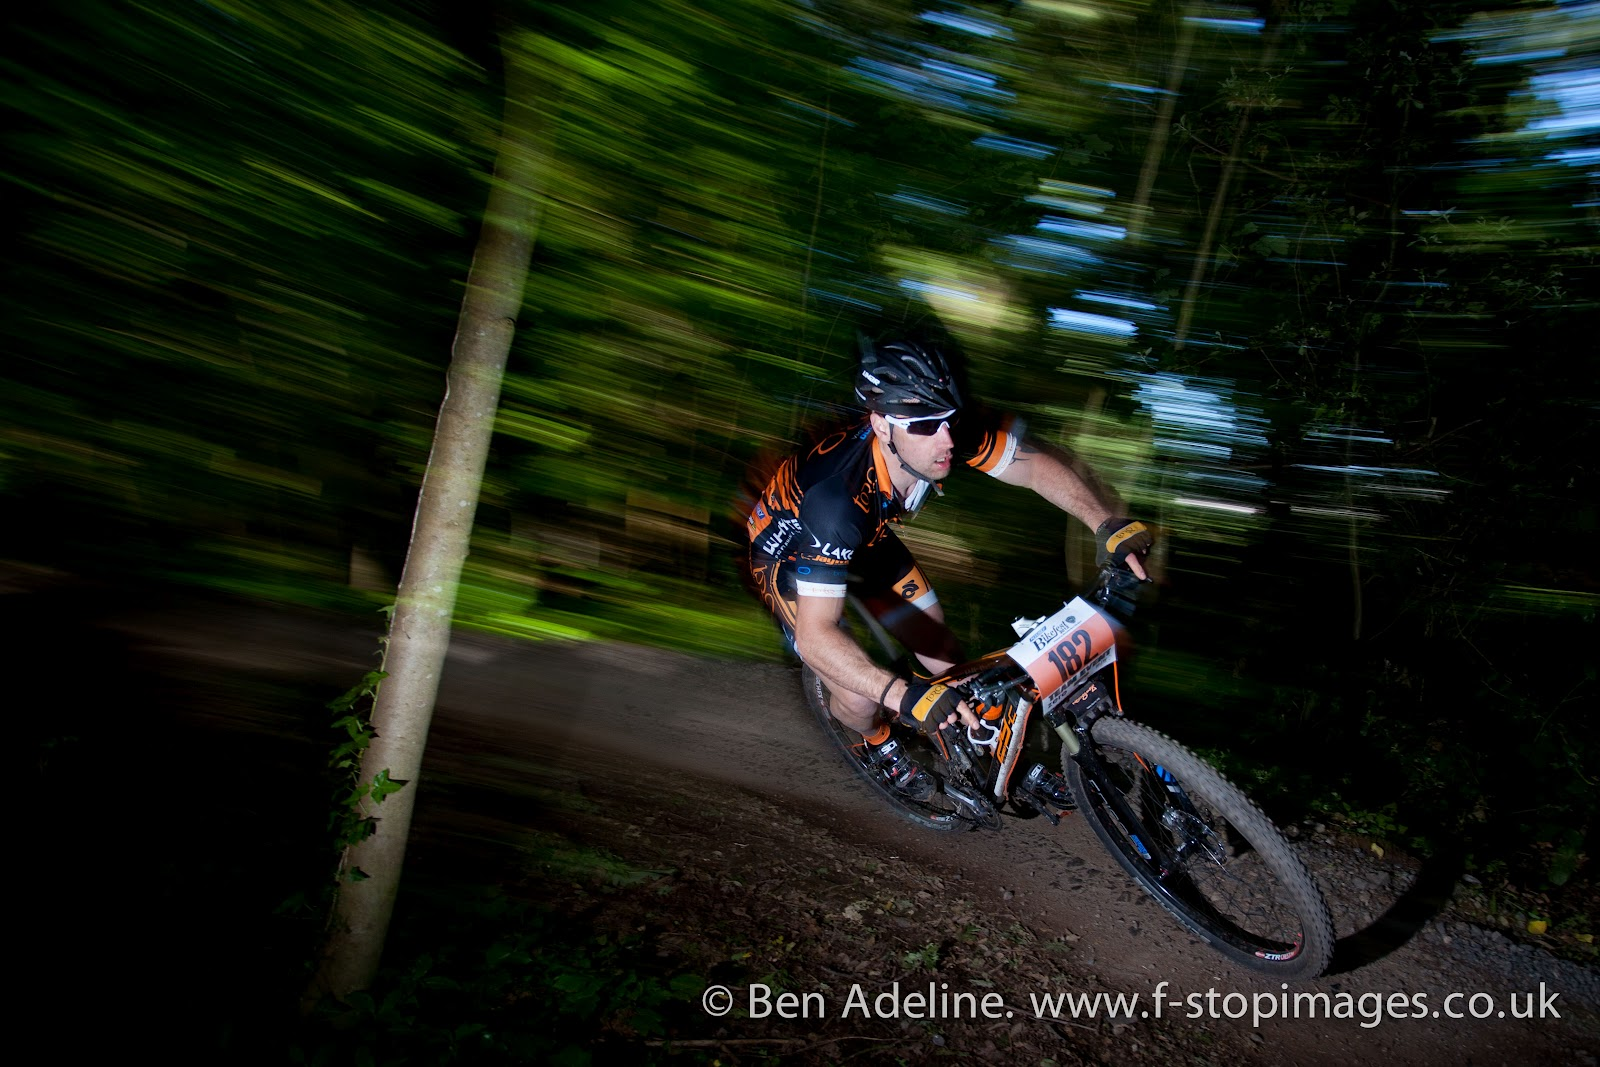 Awesome Mountain Biking Photography